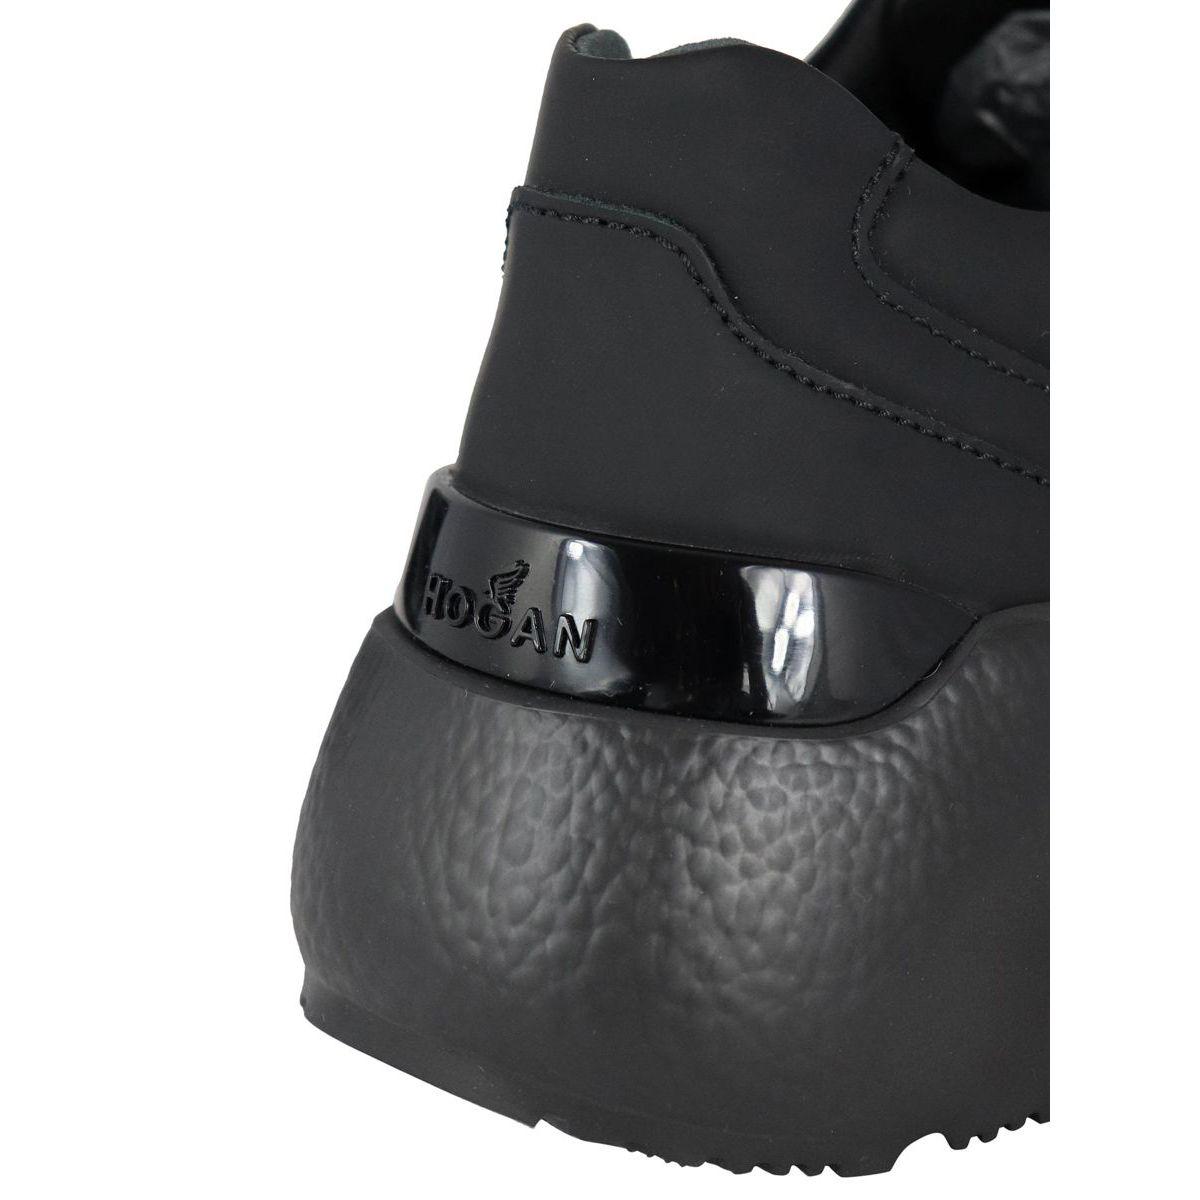 FONDO 443 sneakers Black Hogan